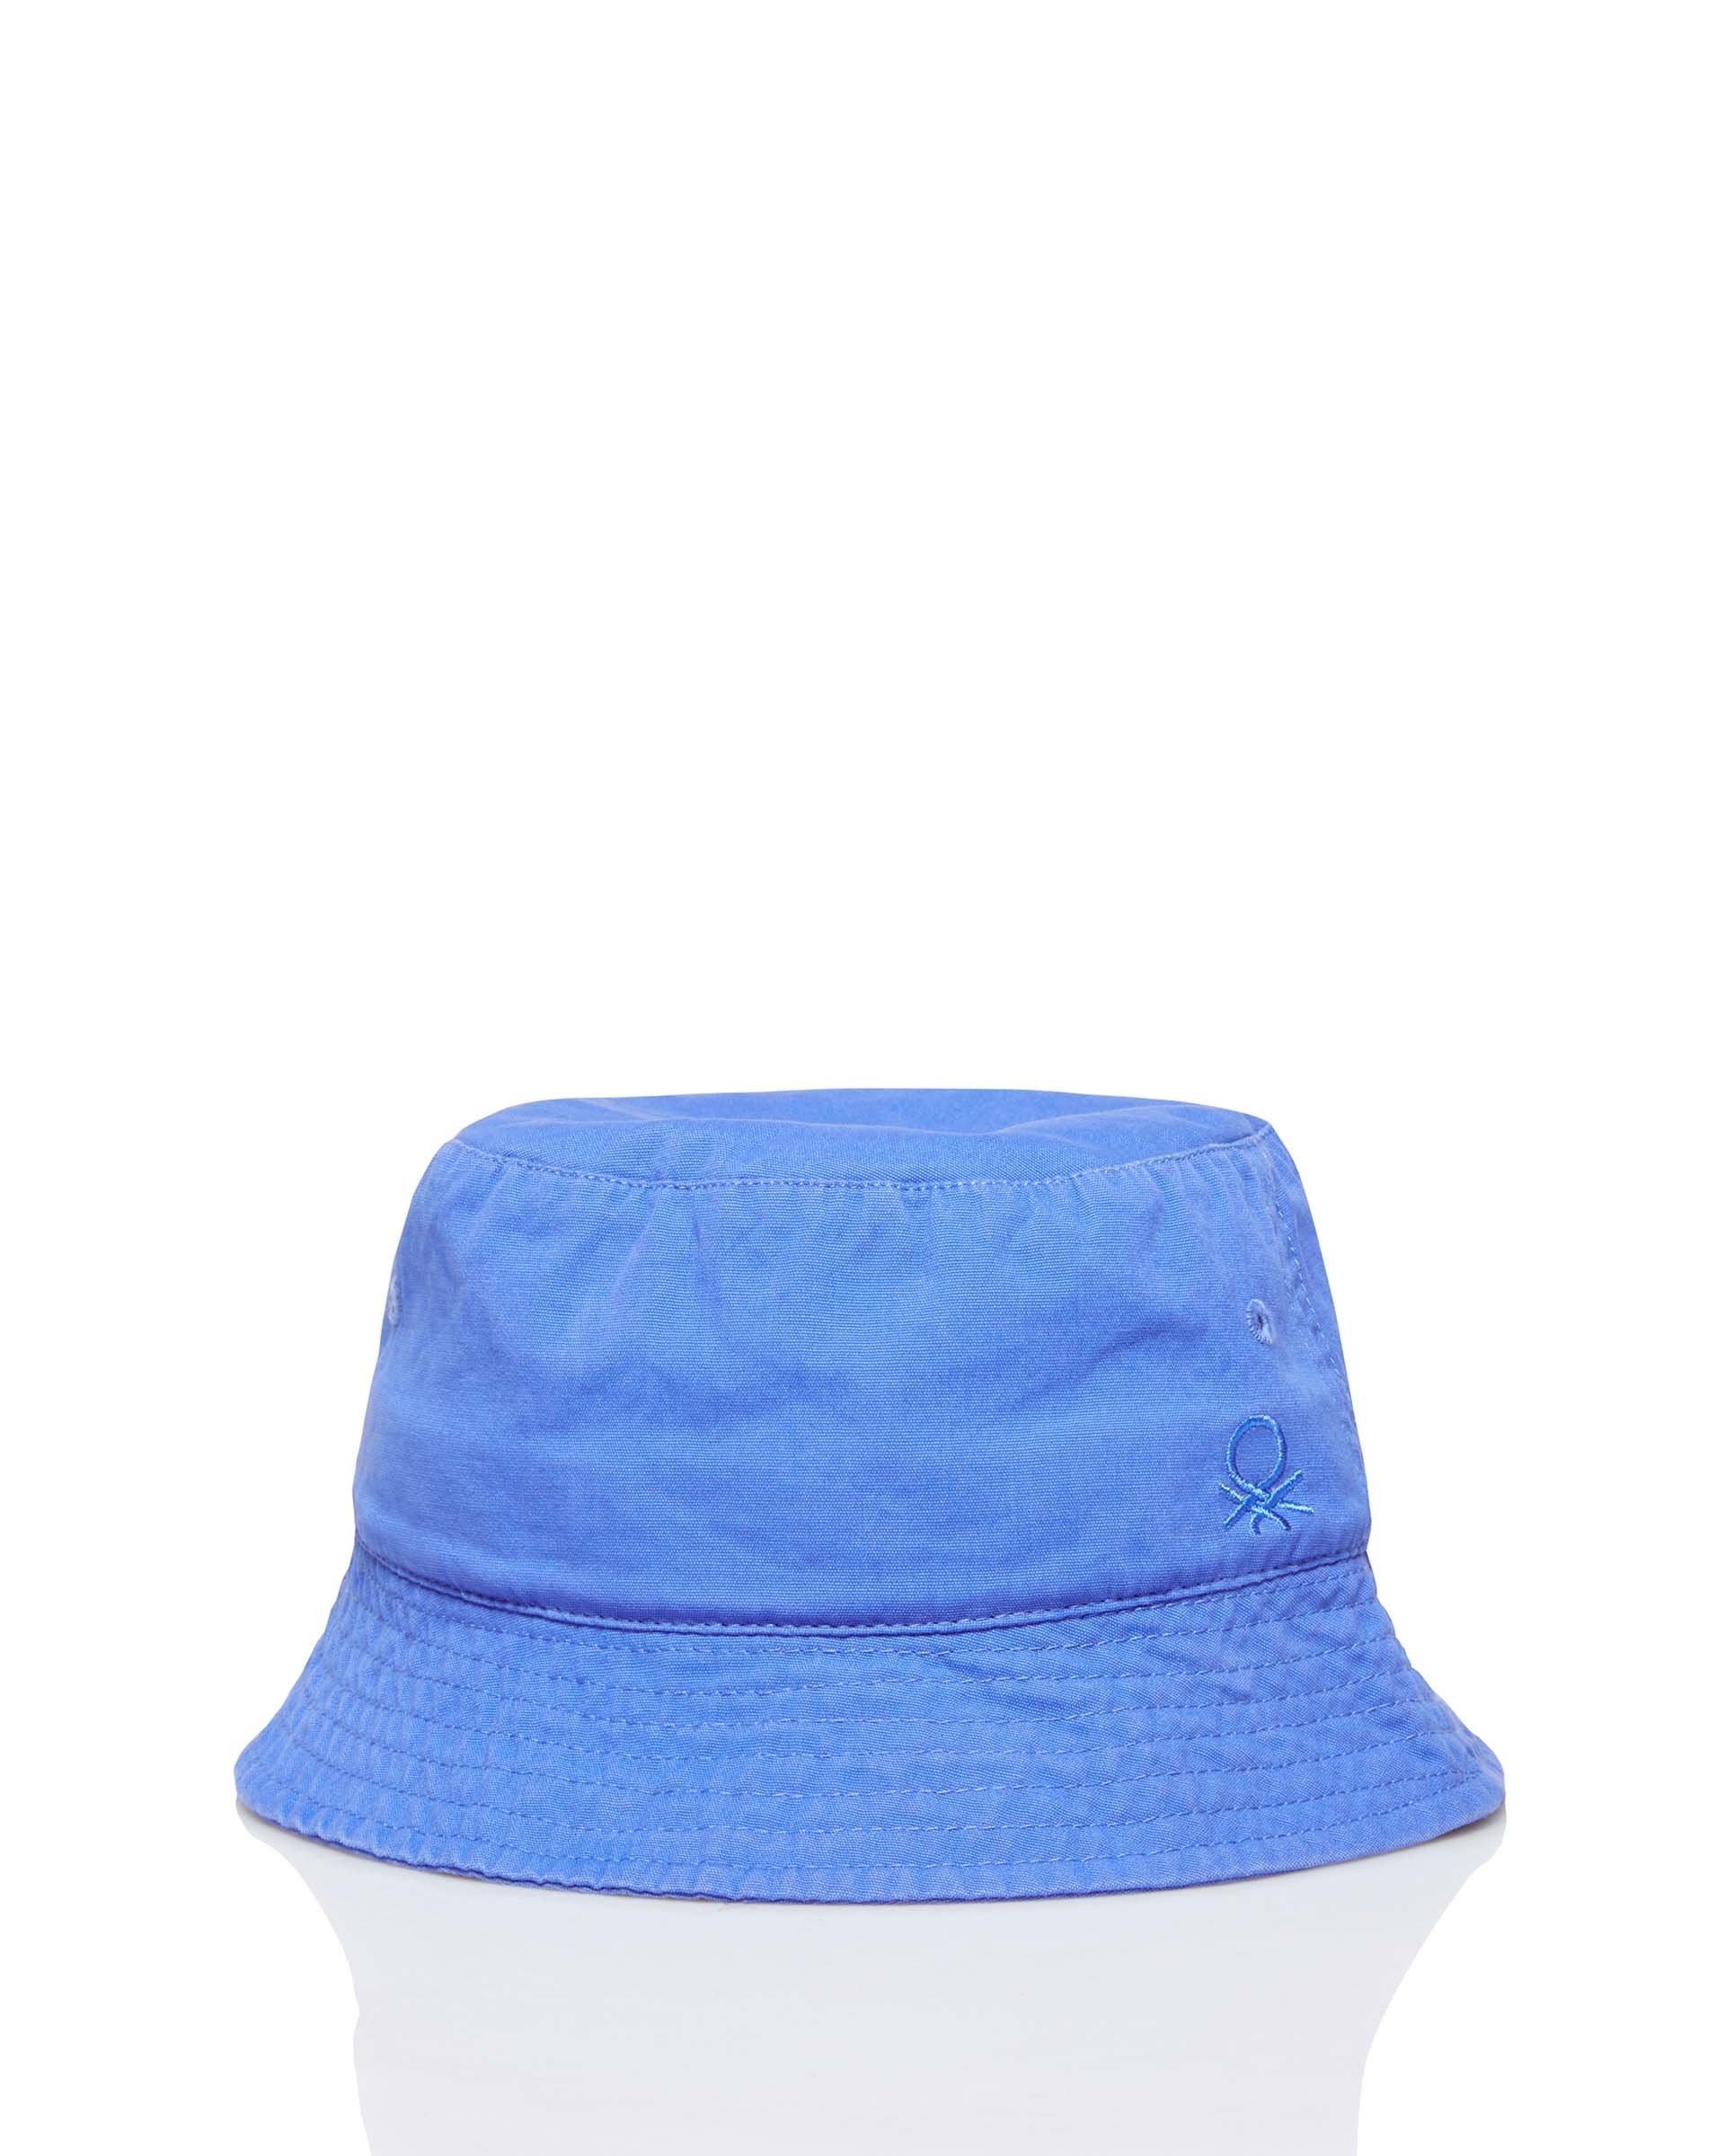 Купить 20P_6G0QB428L_68A, Панама для мальчиков Benetton 6G0QB428L_68A р-р 104, United Colors of Benetton